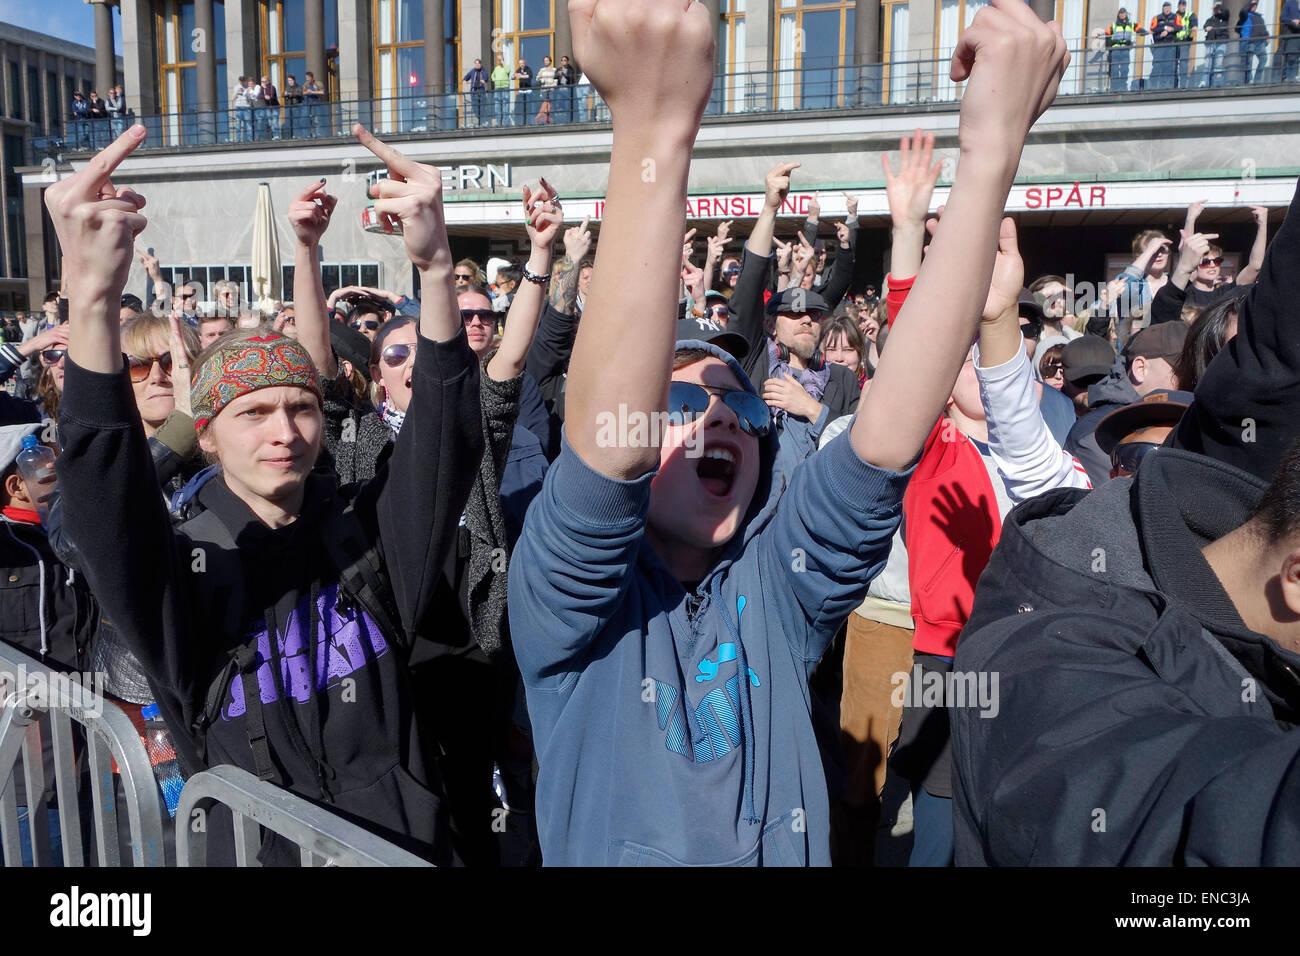 Protesting crowd, counter-demonstrators showing middle finger during PEGIDA demonstrations against islamisation - Stock Image